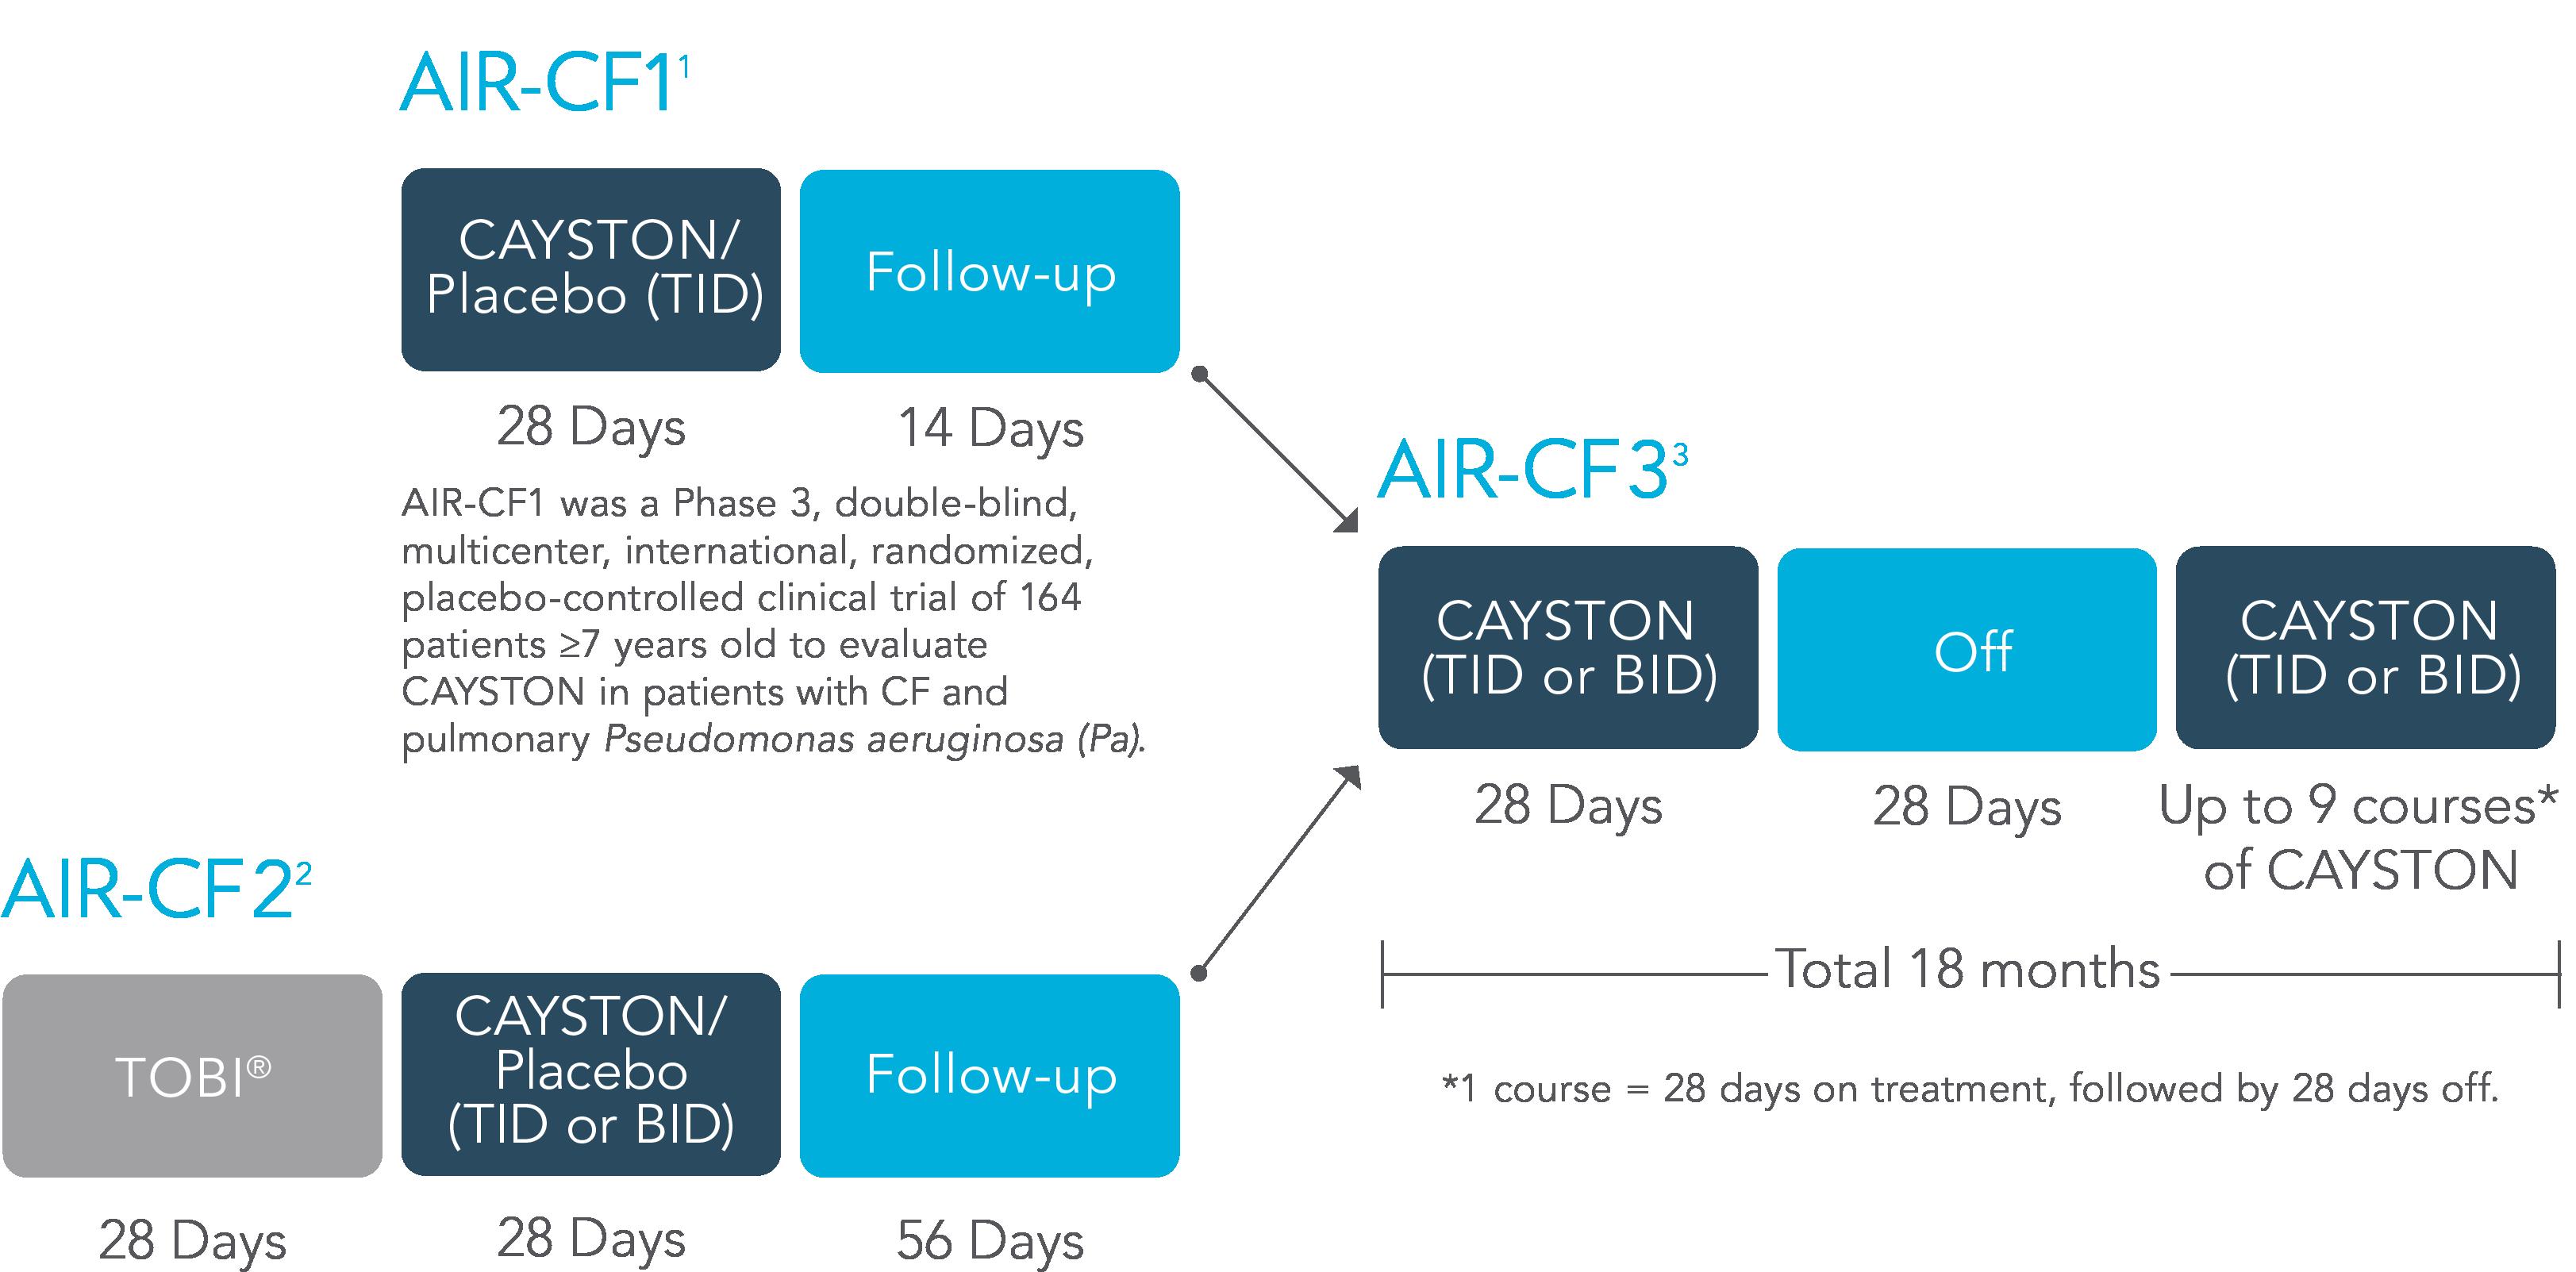 CAYSTON AIR-CF1 Study Design chart